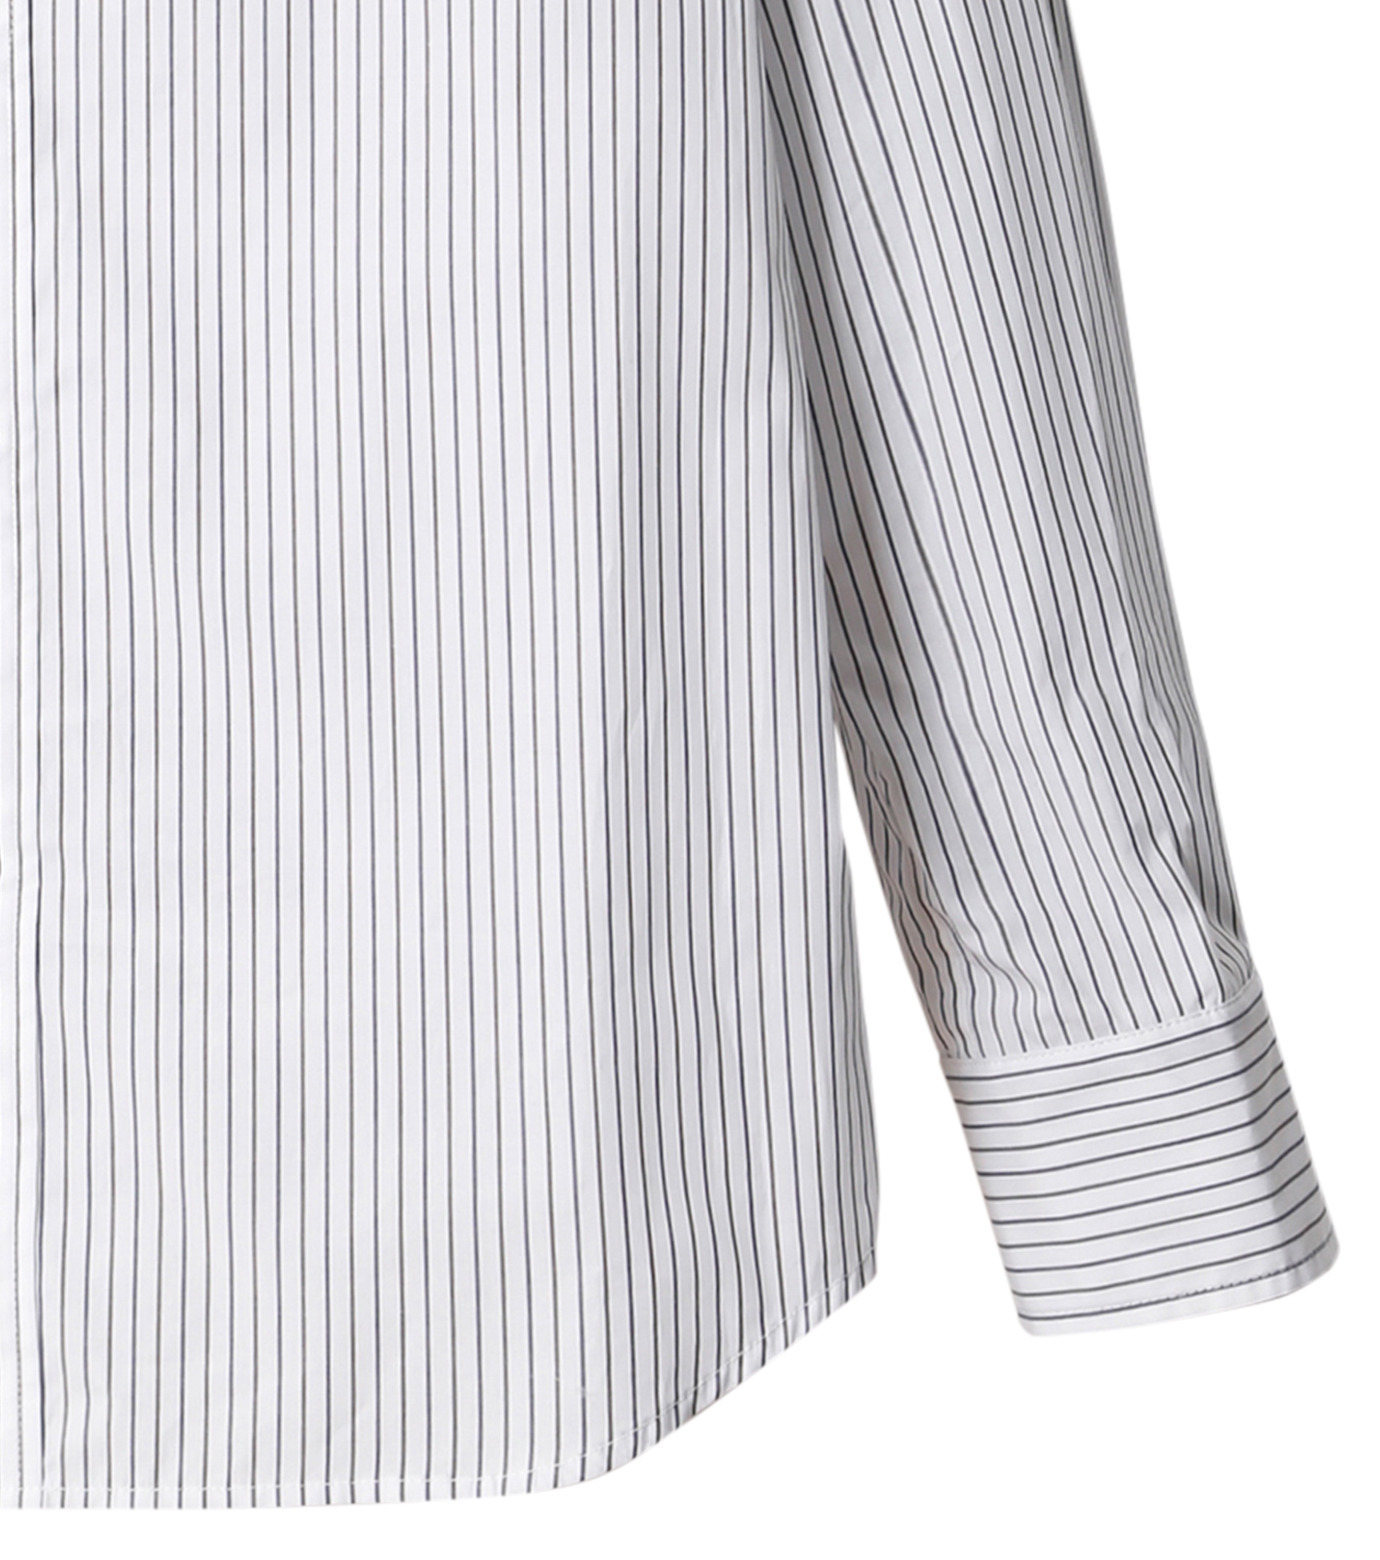 DRESSEDUNDRESSED(ドレスドアンドレスド)のPinstripe Color Block Men's Shirt-WHITE(シャツ/shirt)-DUW16105-4-W 拡大詳細画像4